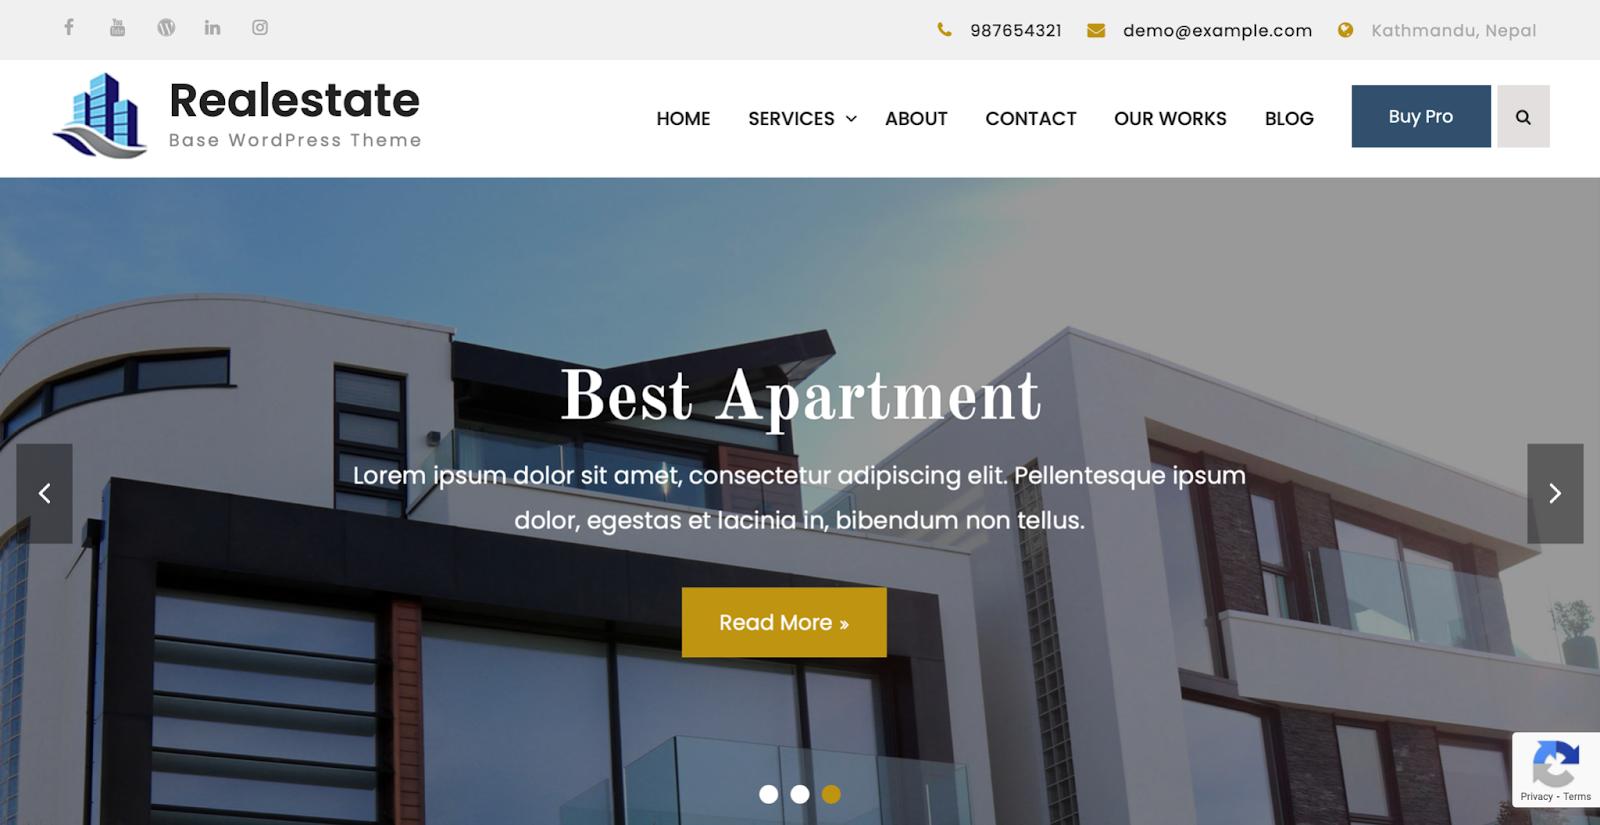 Realestate Base freelancer WordPress themes